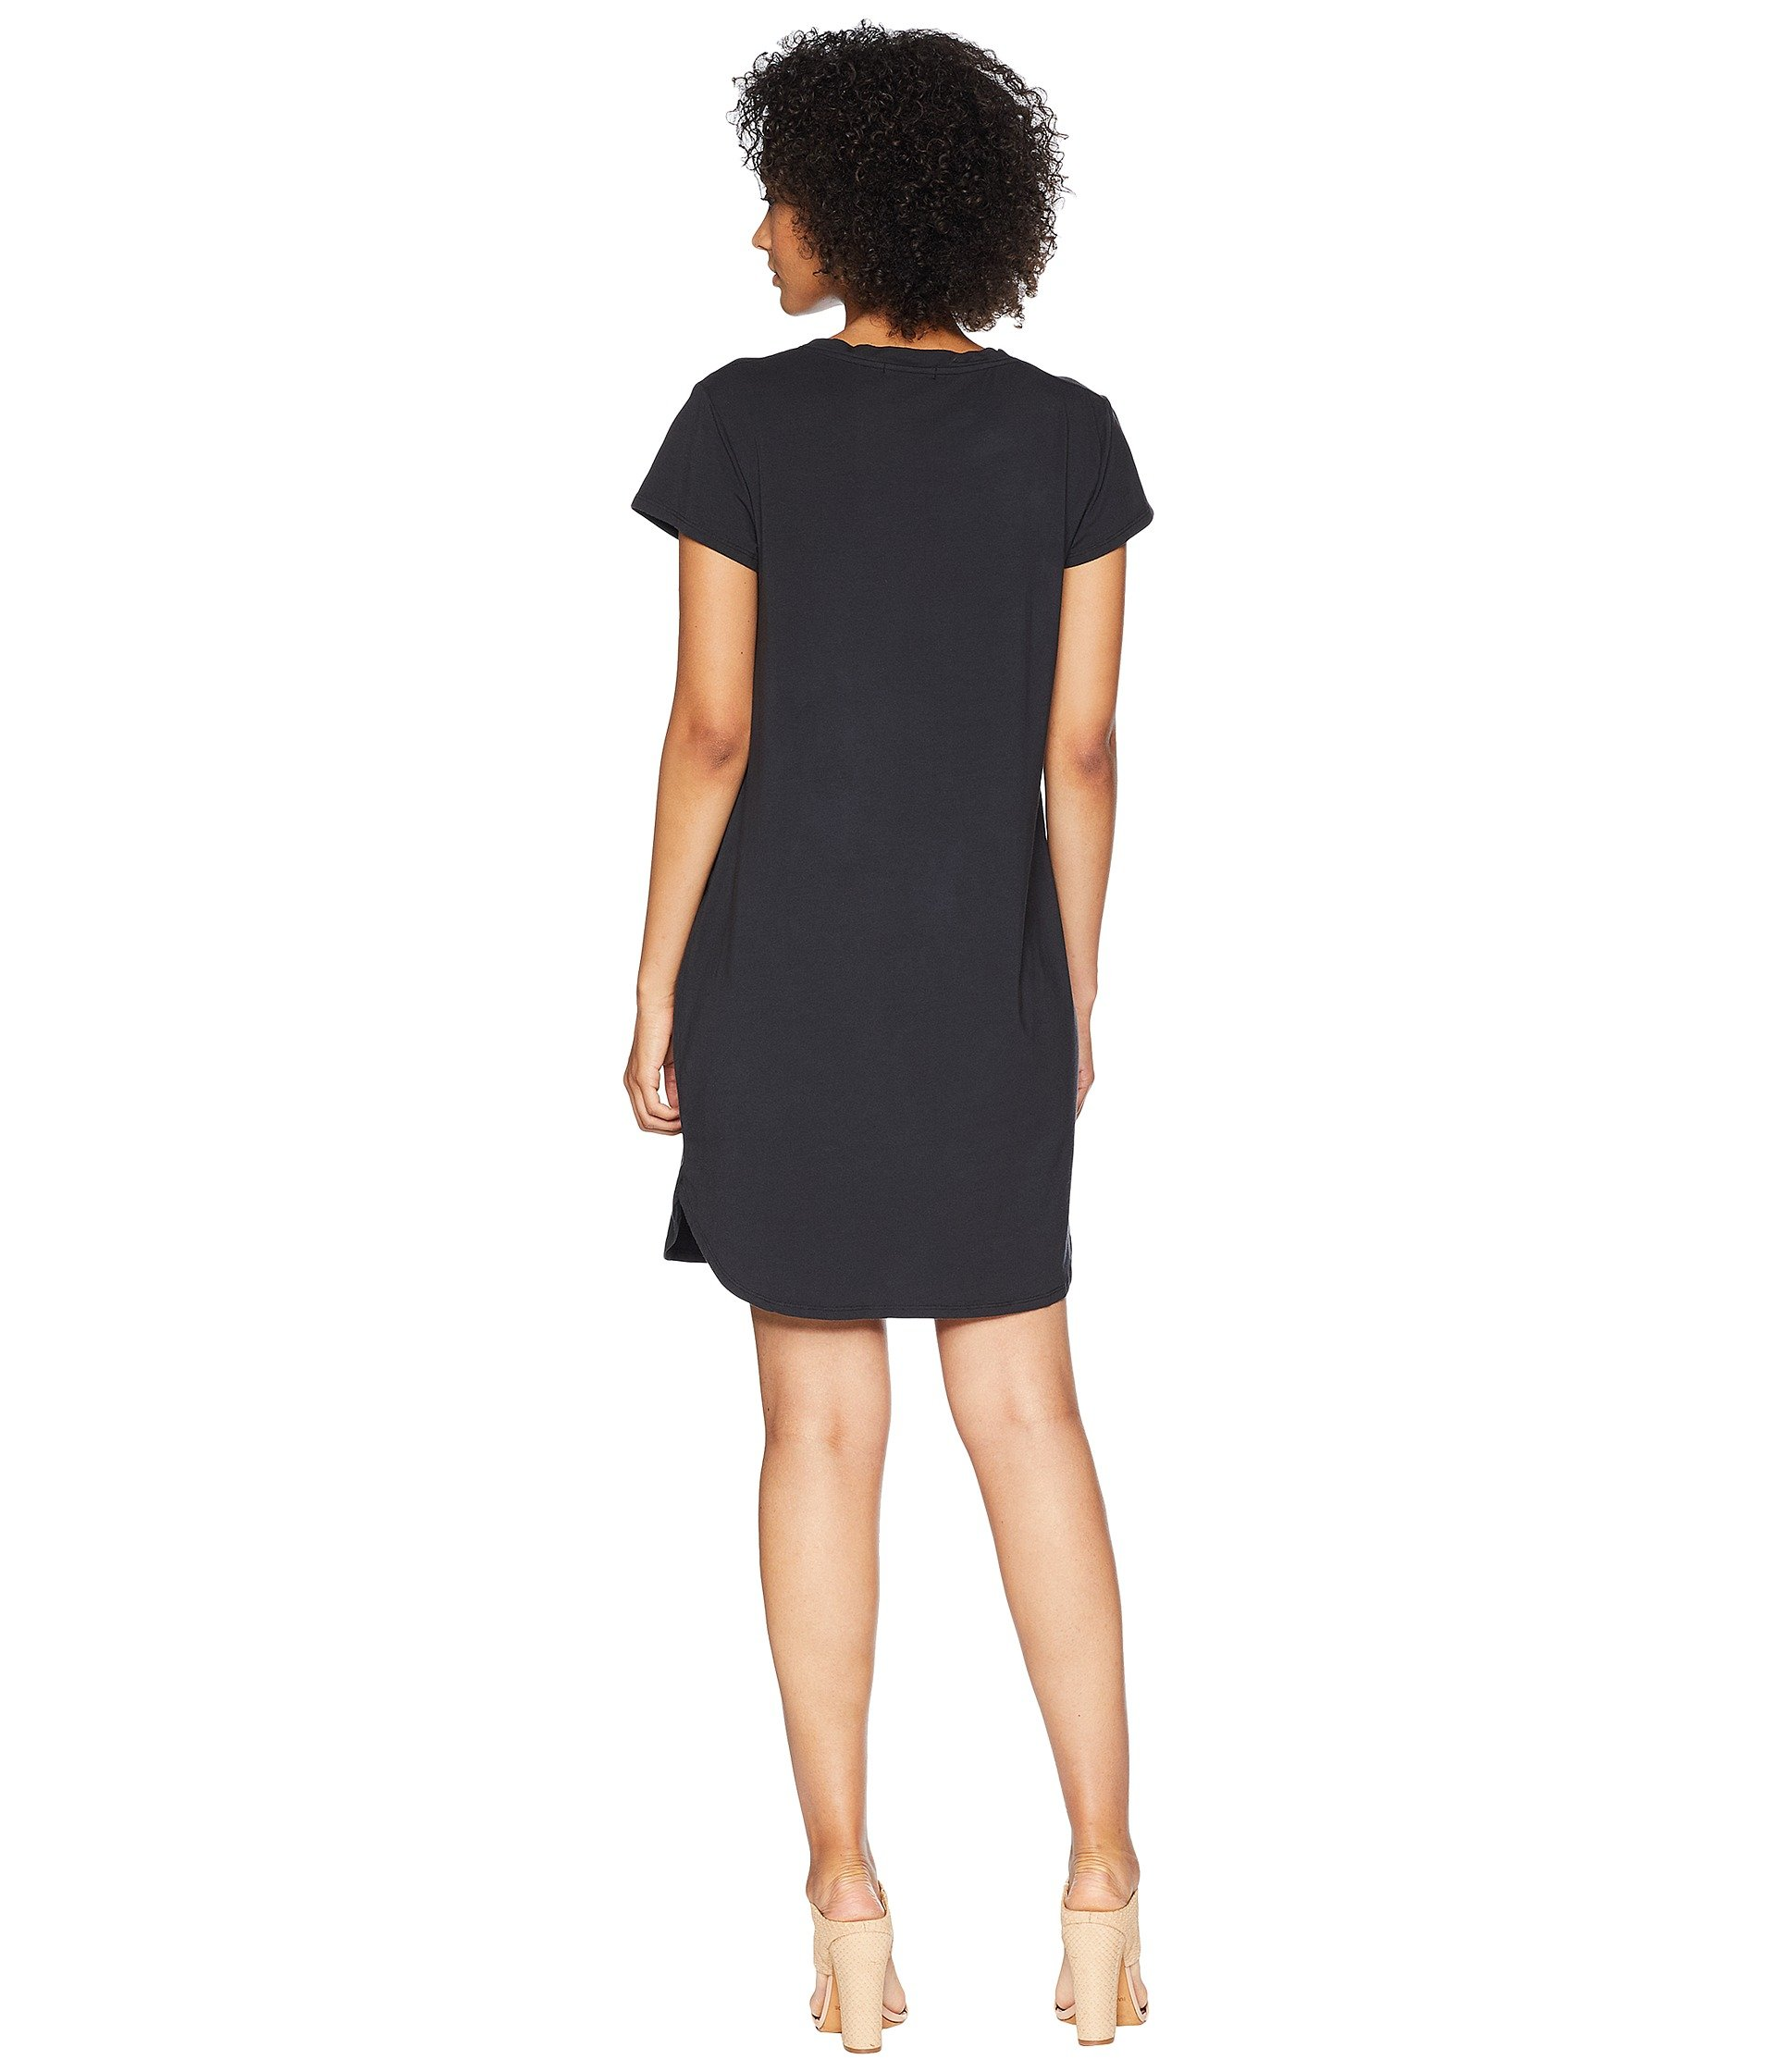 Kylie Fresh Produce T shirt Black Dress rr5znxq1O